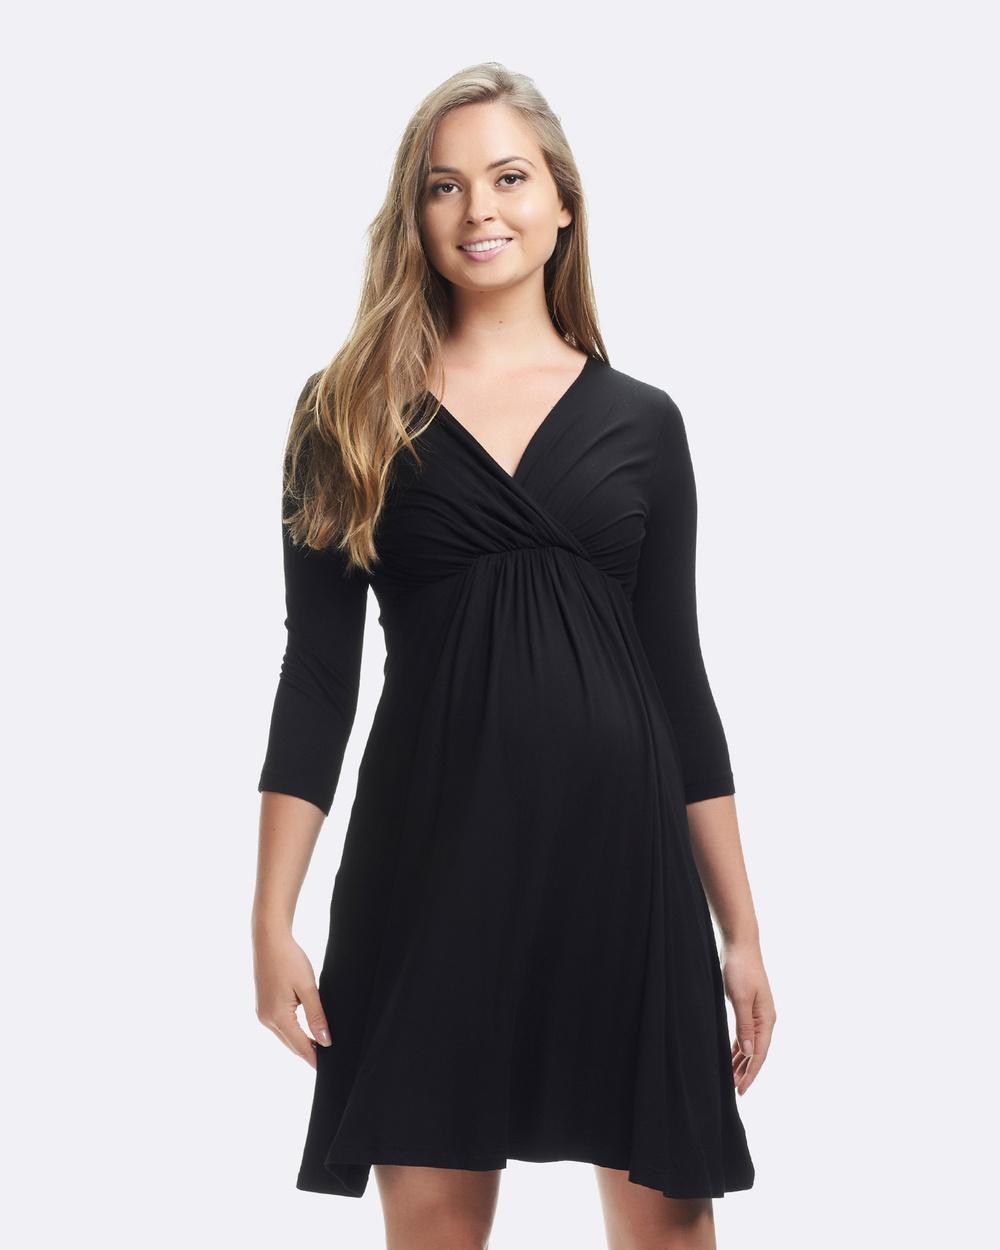 Soon Maternity Rio 3 4 Sleeve Dress Dresses Black Rio 3-4 Sleeve Dress